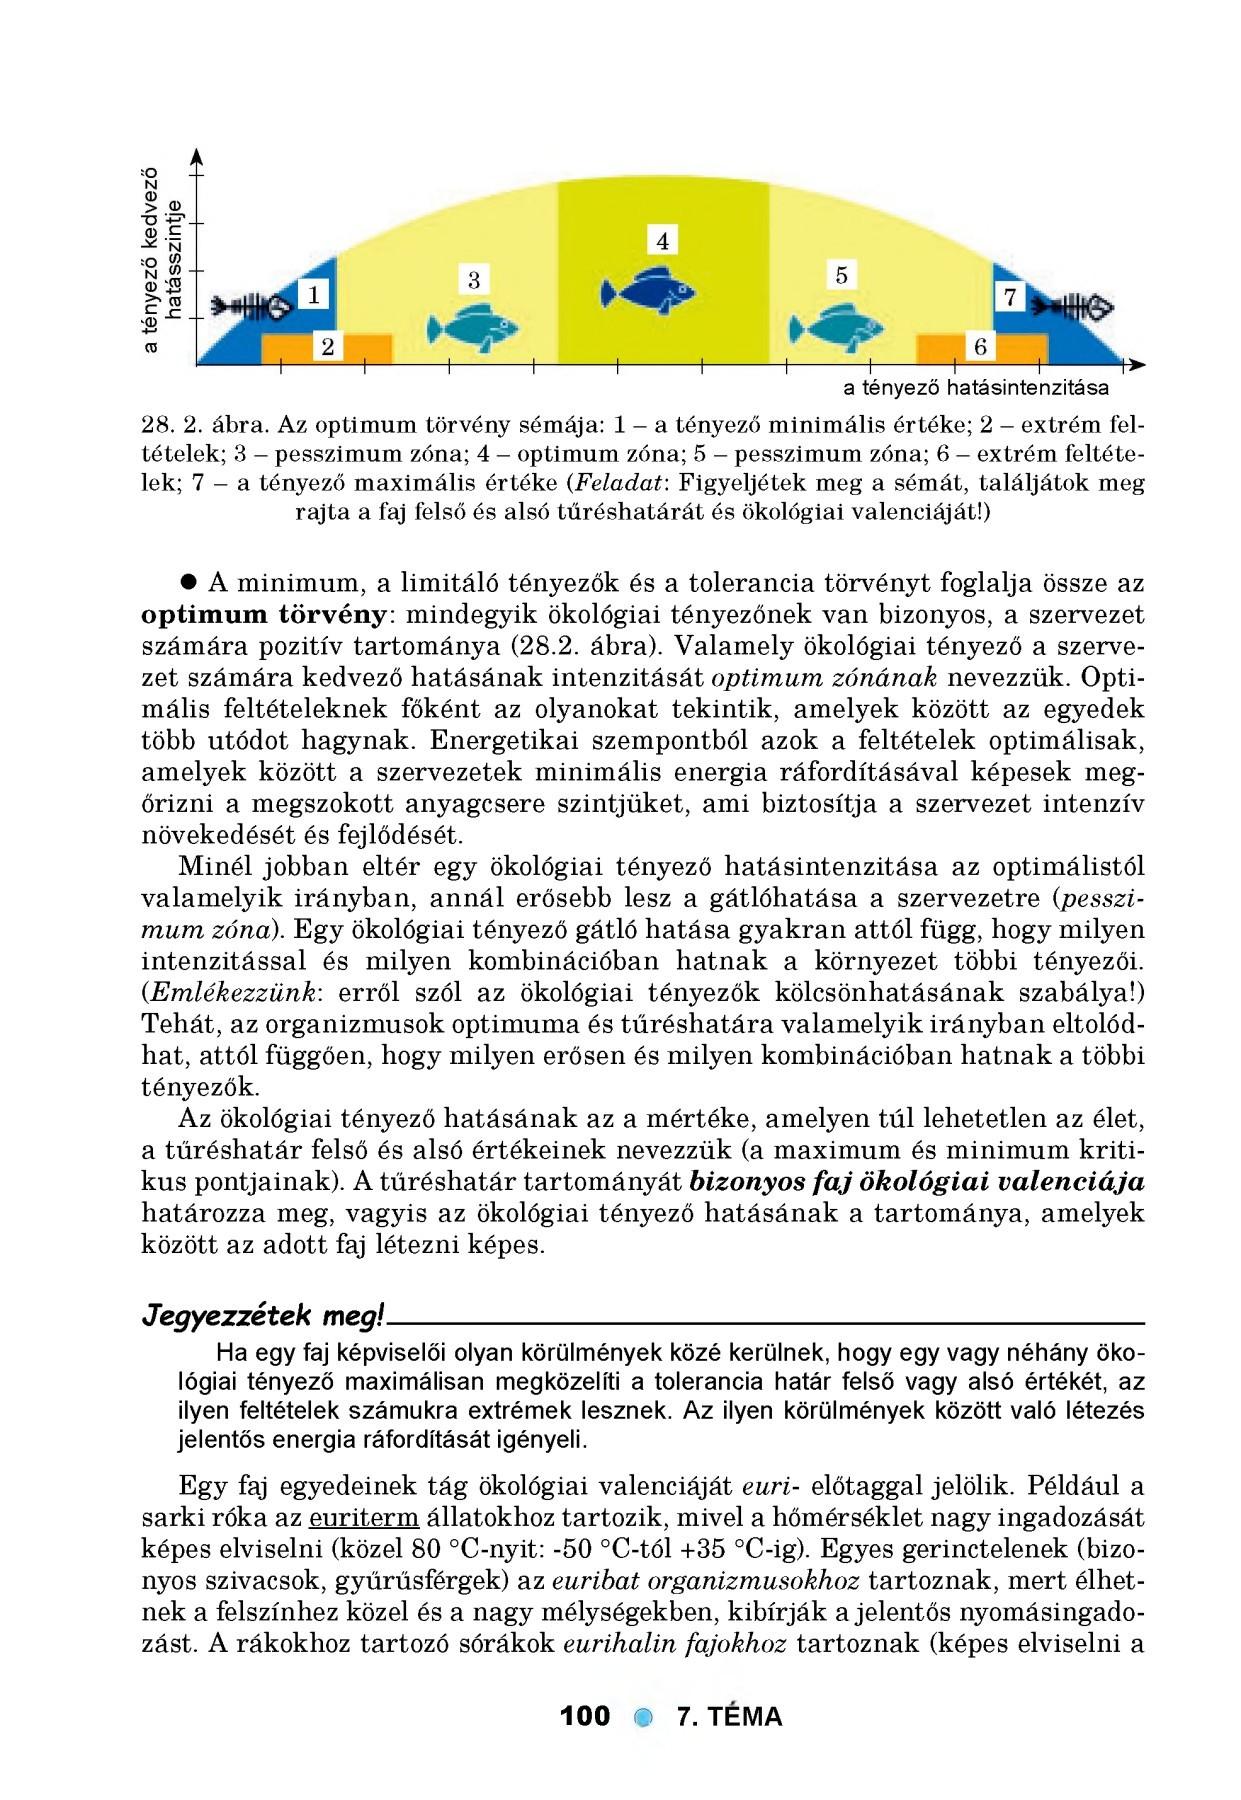 parazita eliminációs séma)